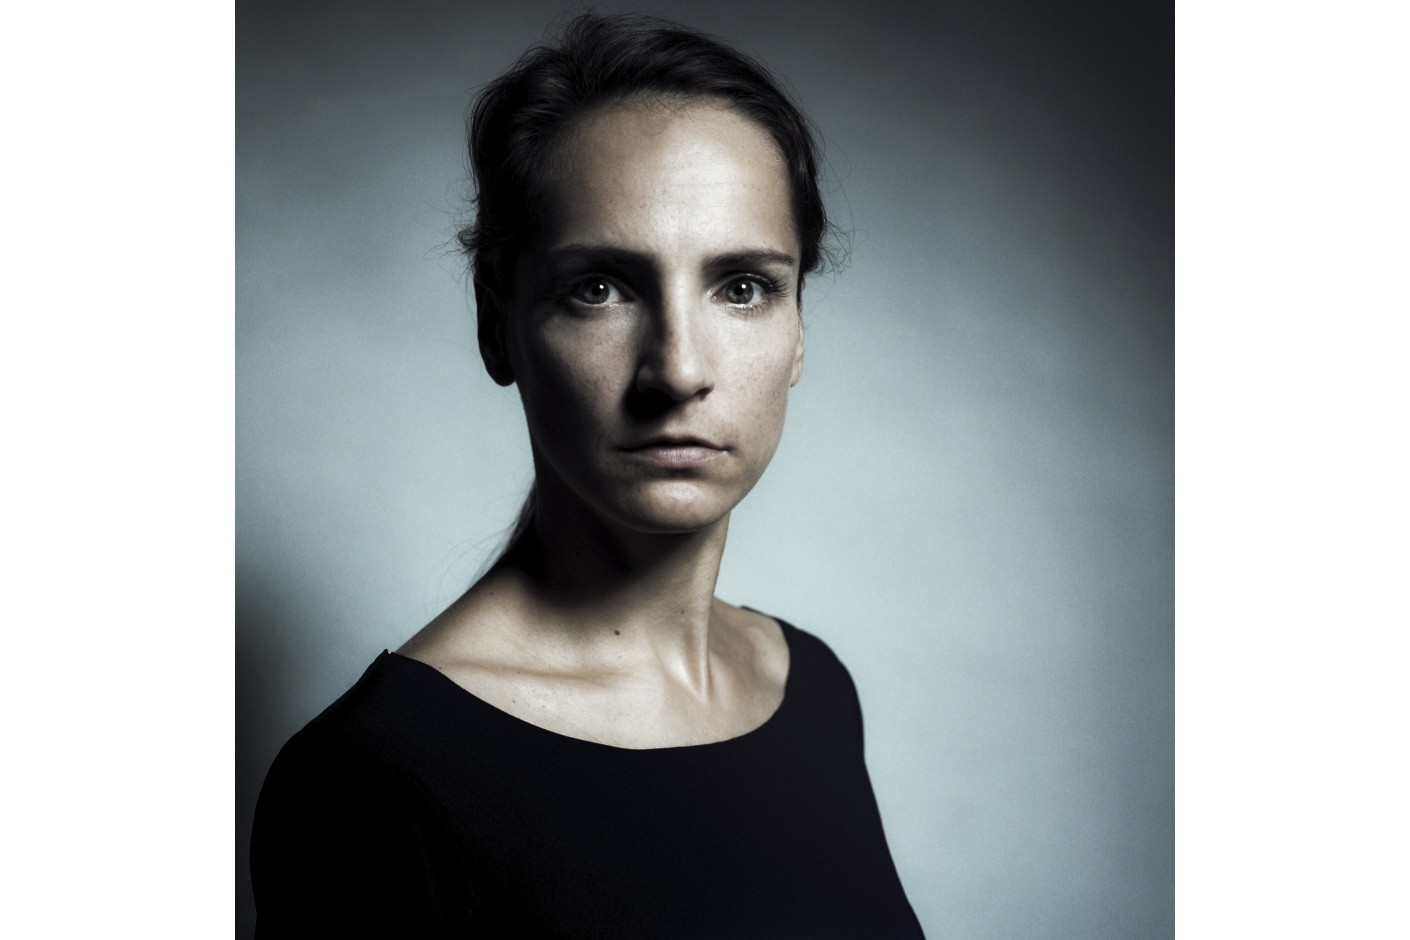 Jelle Pieter de Boer Hasselblad Photography ELISE